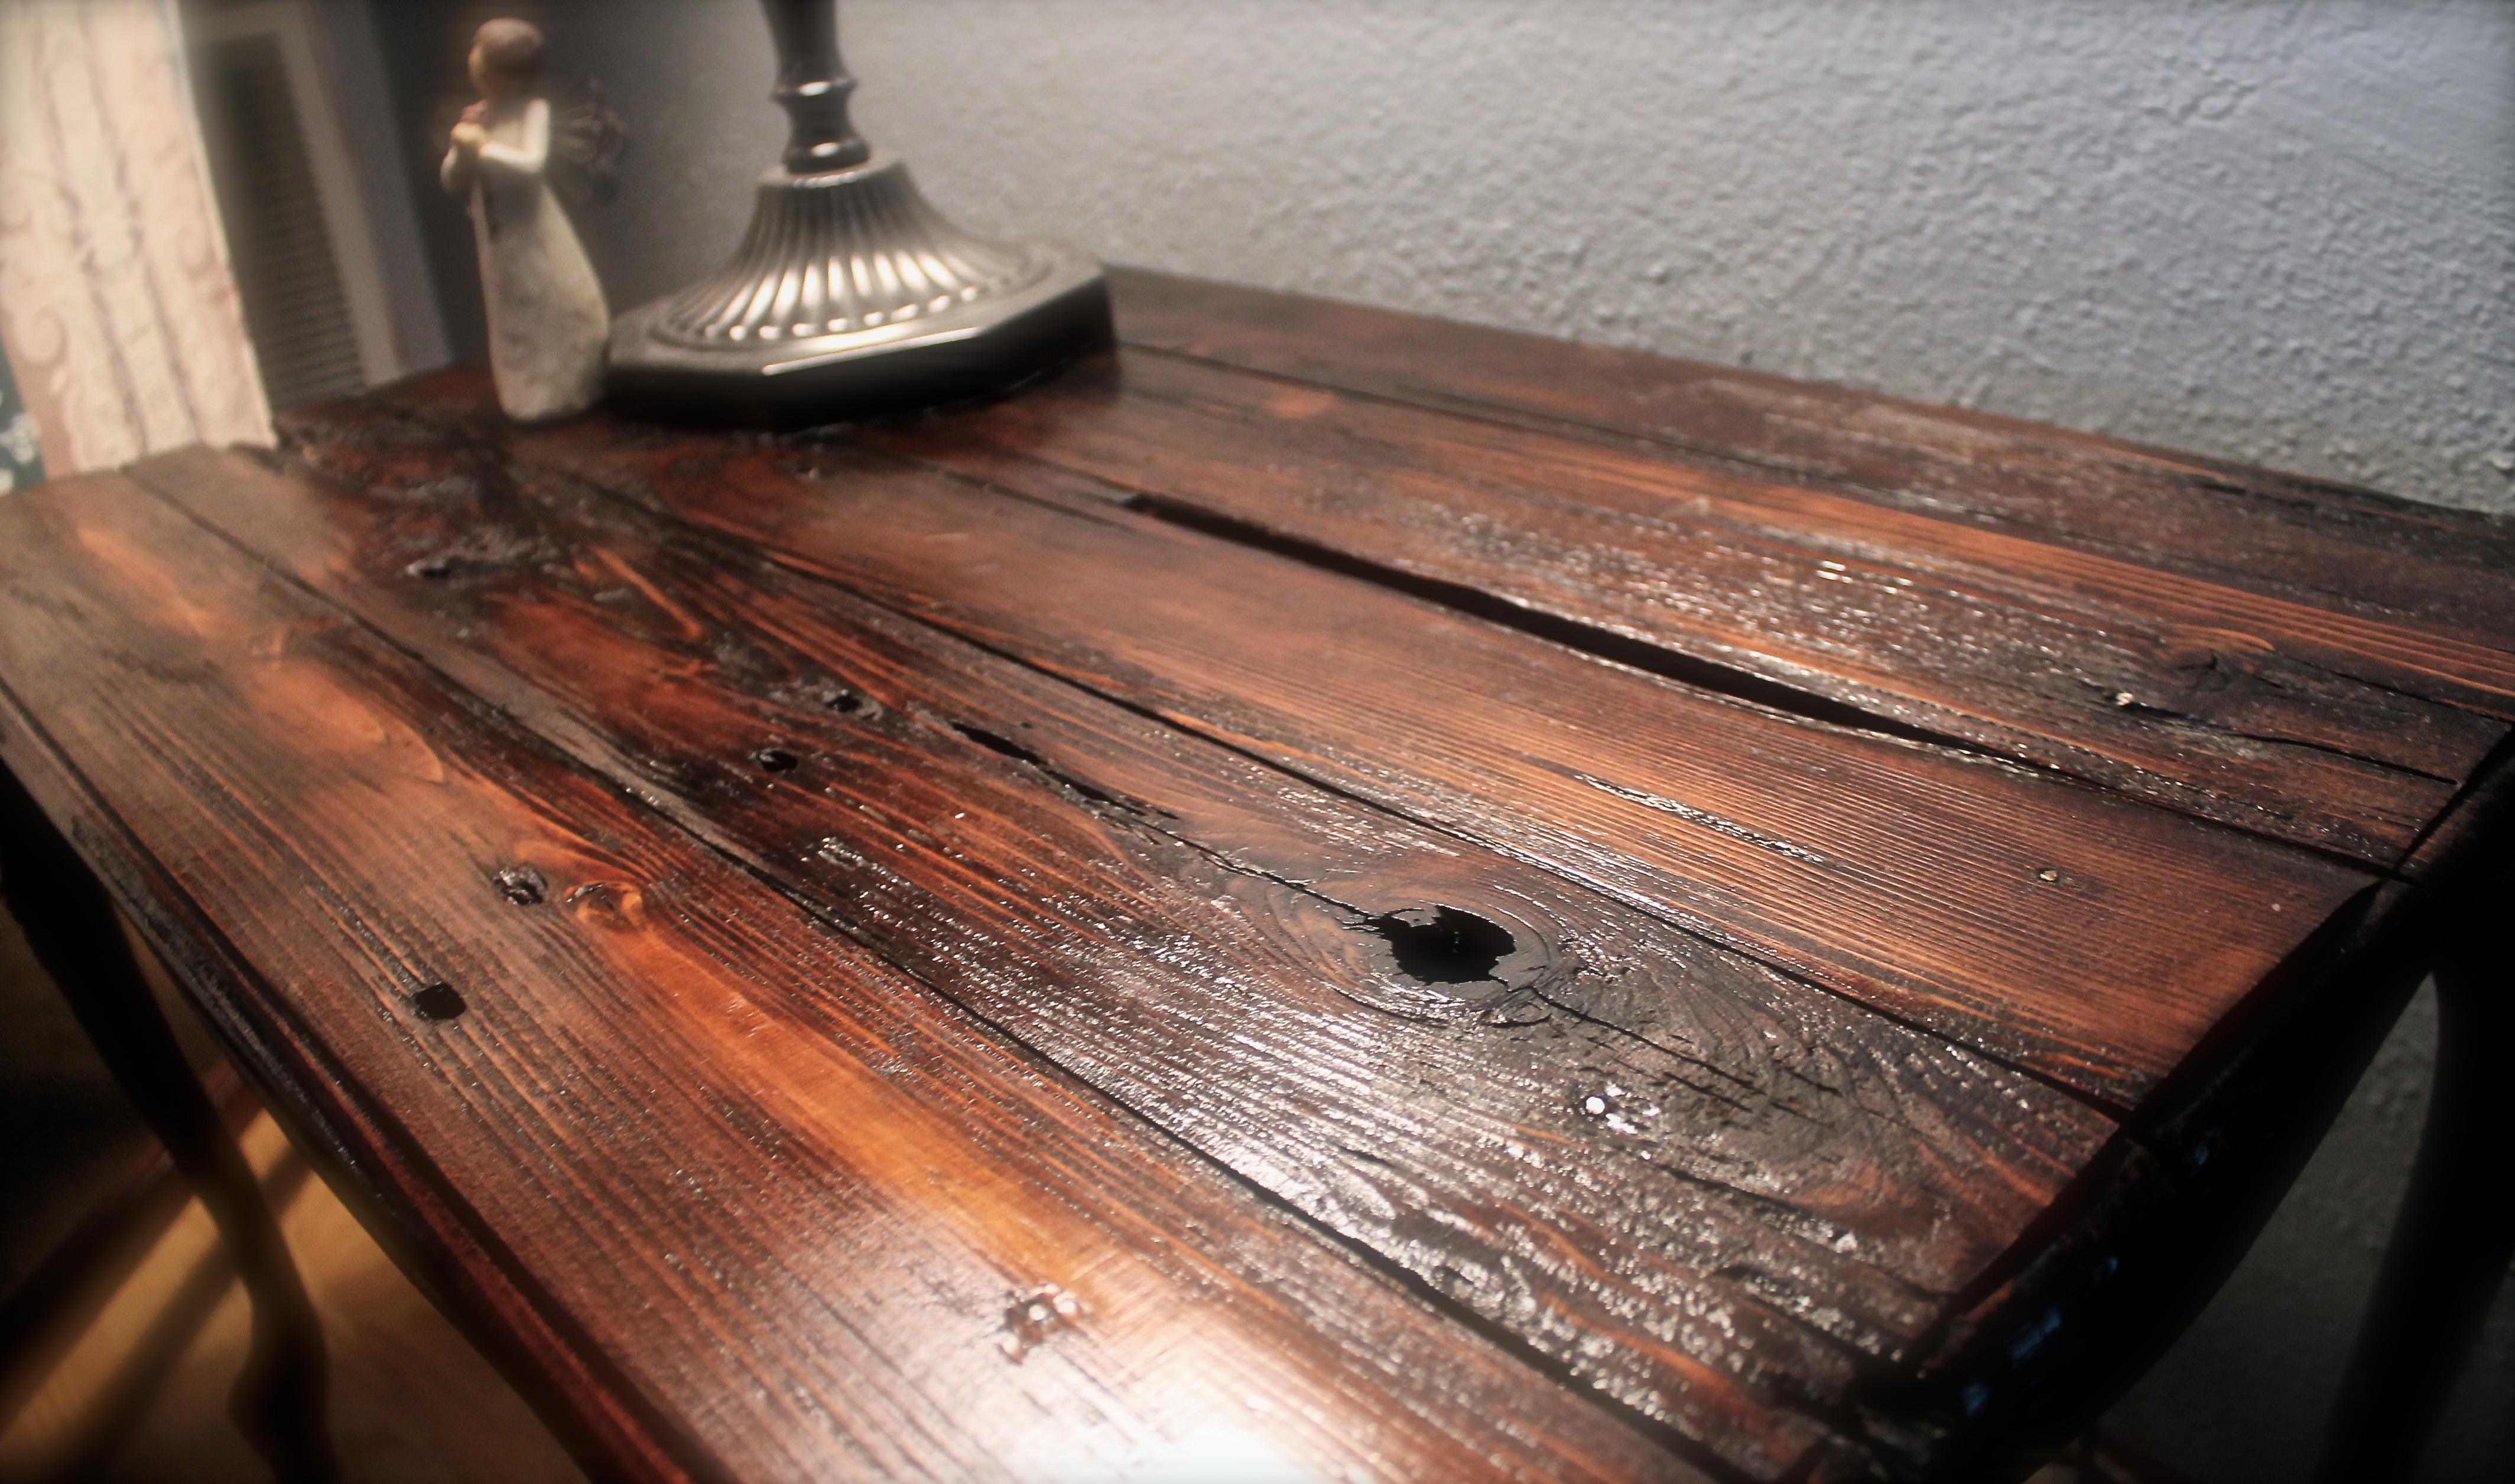 Great Refurbished Rustic Table